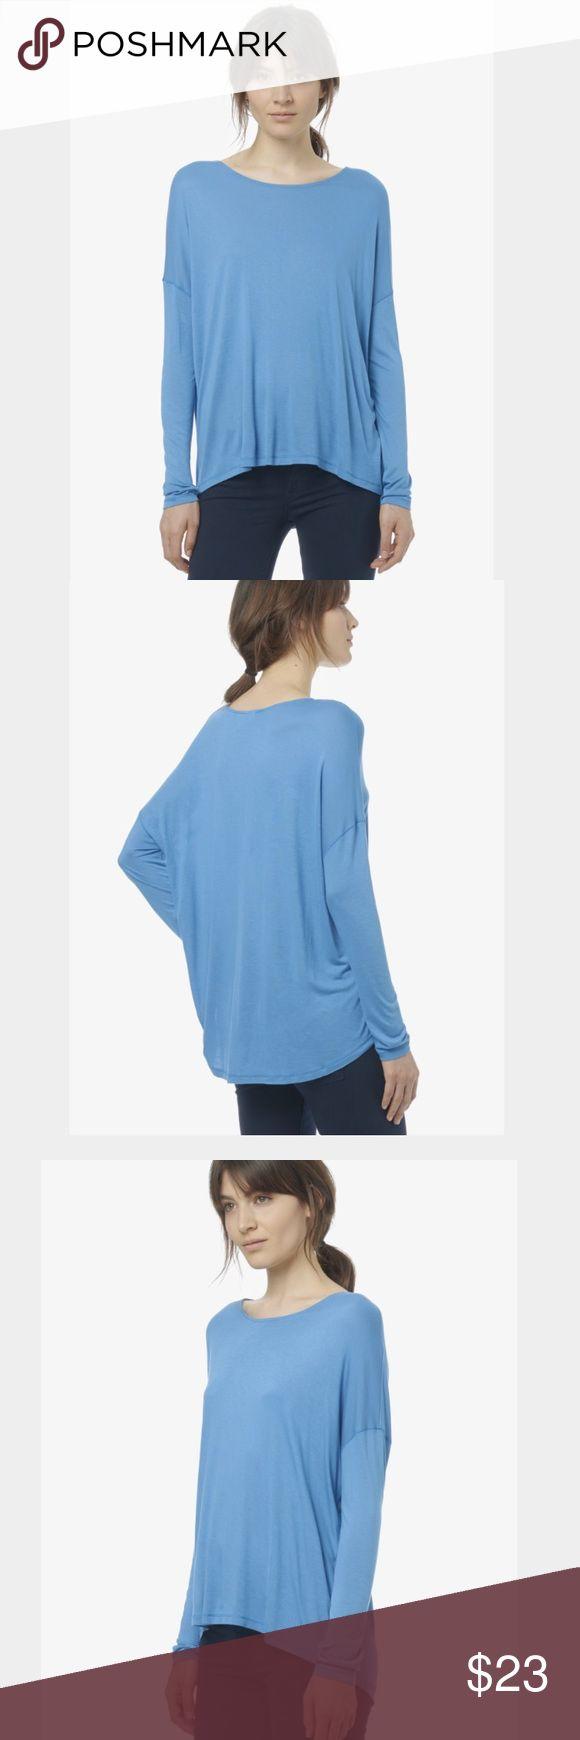 Vince long sleeve t-shirt 👢 EUC Vince long sleeve drop shoulder loose blue t-shirt, chic and comfy 👢 Vince Tops Tees - Long Sleeve